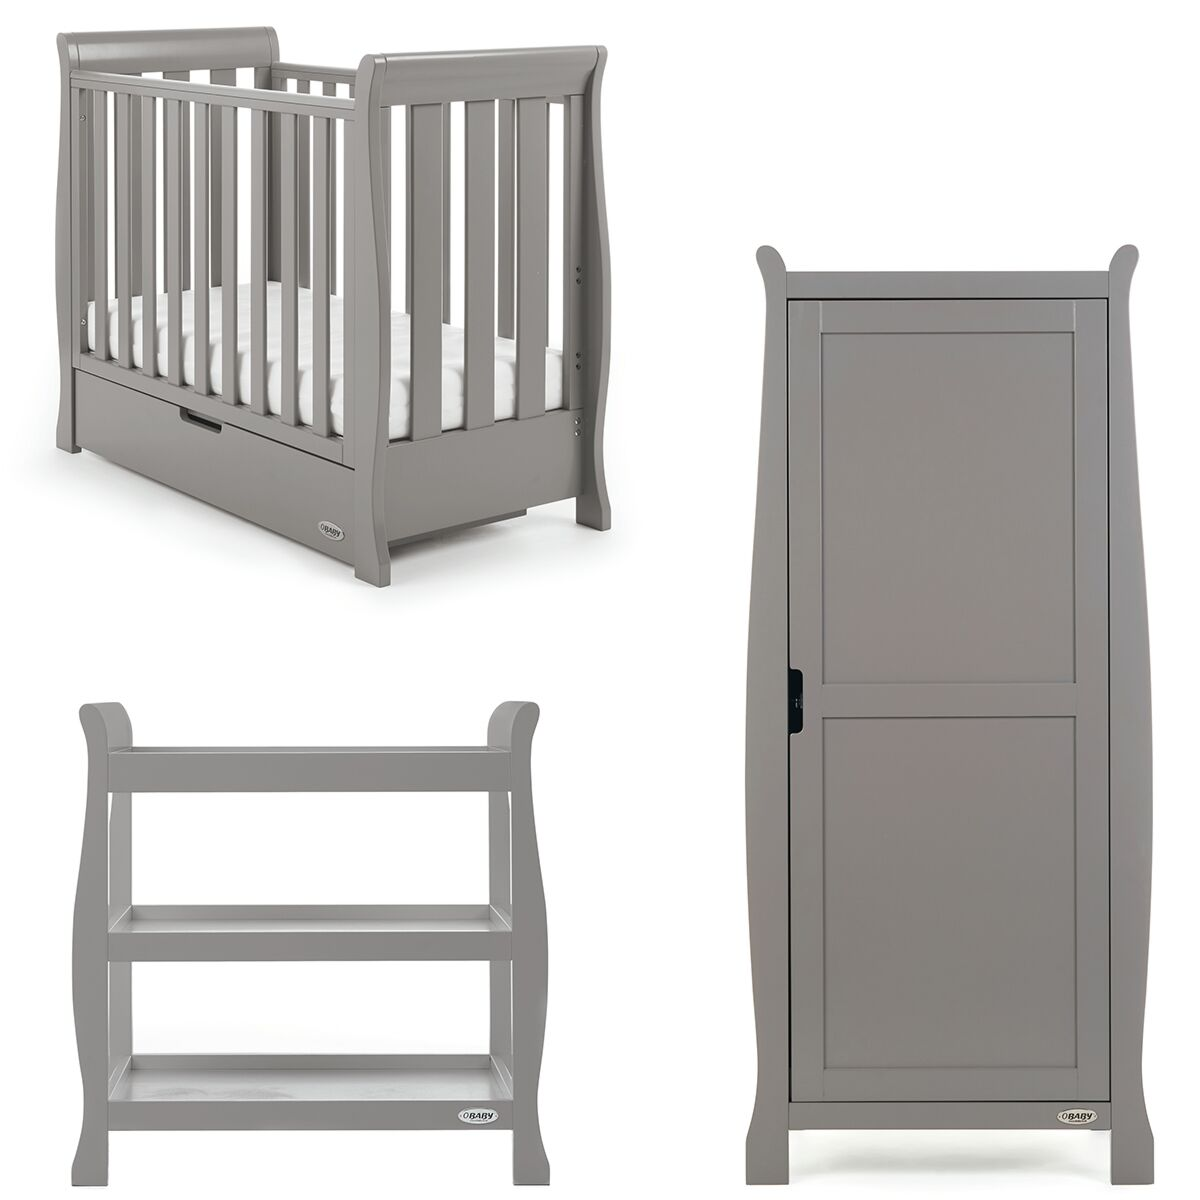 Obaby Stamford Space Saver 3 Piece Room Set - Taupe Grey